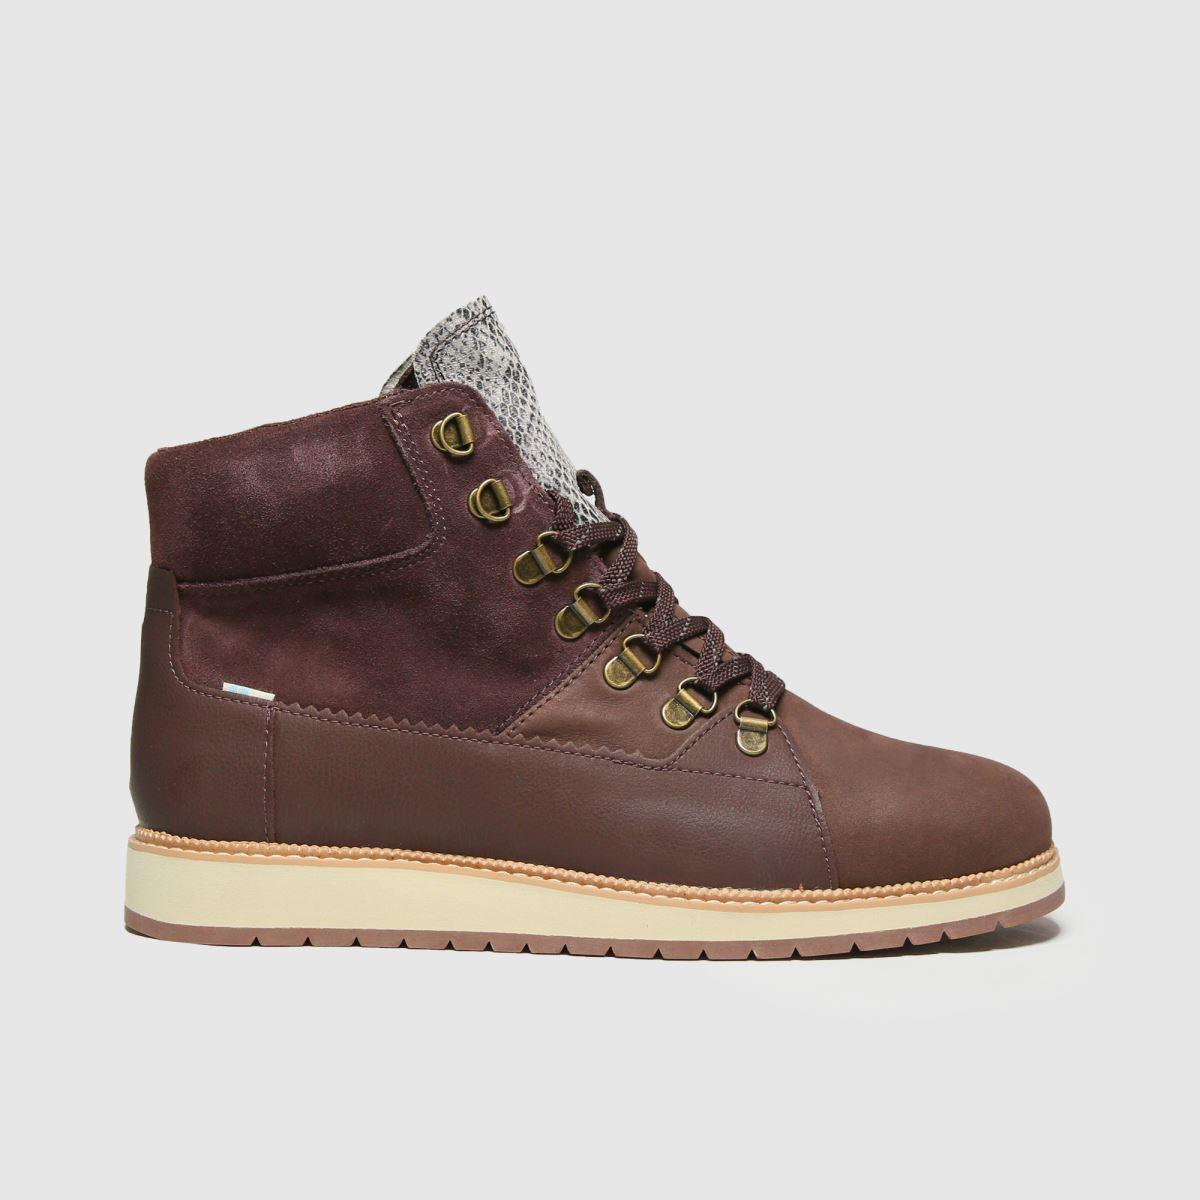 TOMS Burgundy Mesa Boots